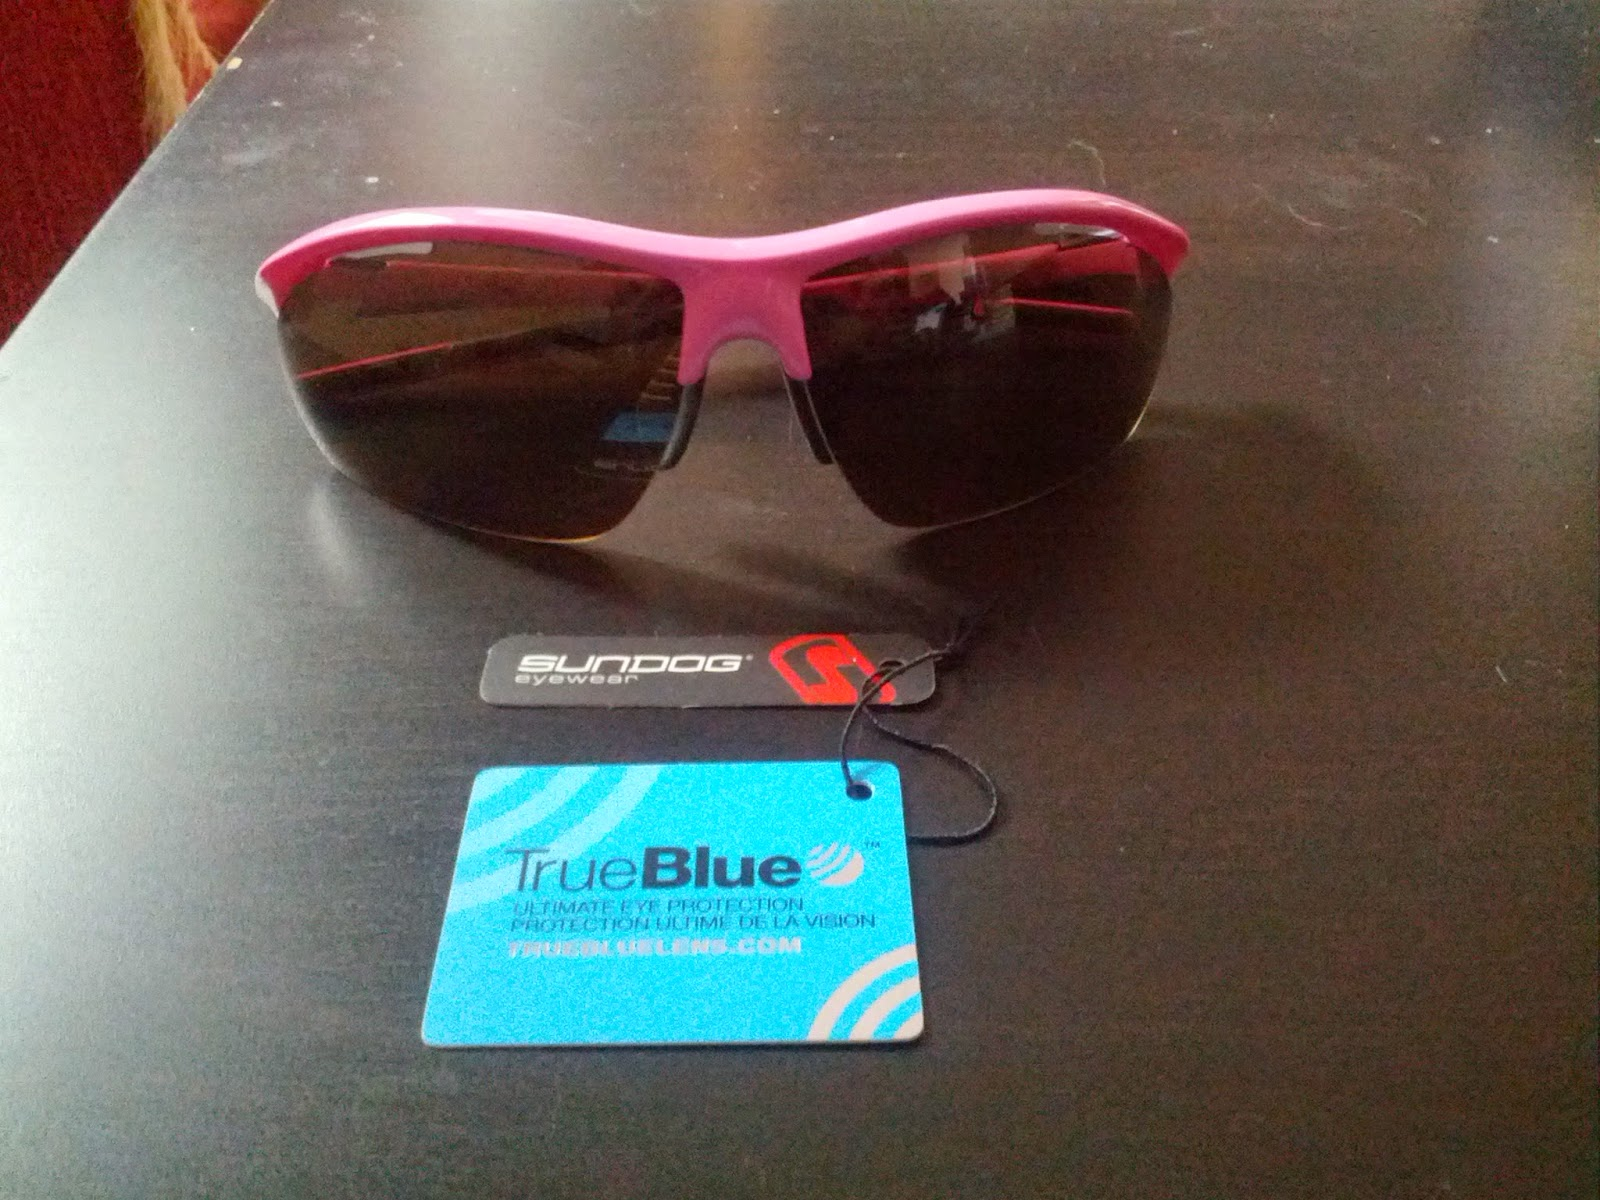 841c5b0a202 West Coast Runner  Sundog Eyewear Discount